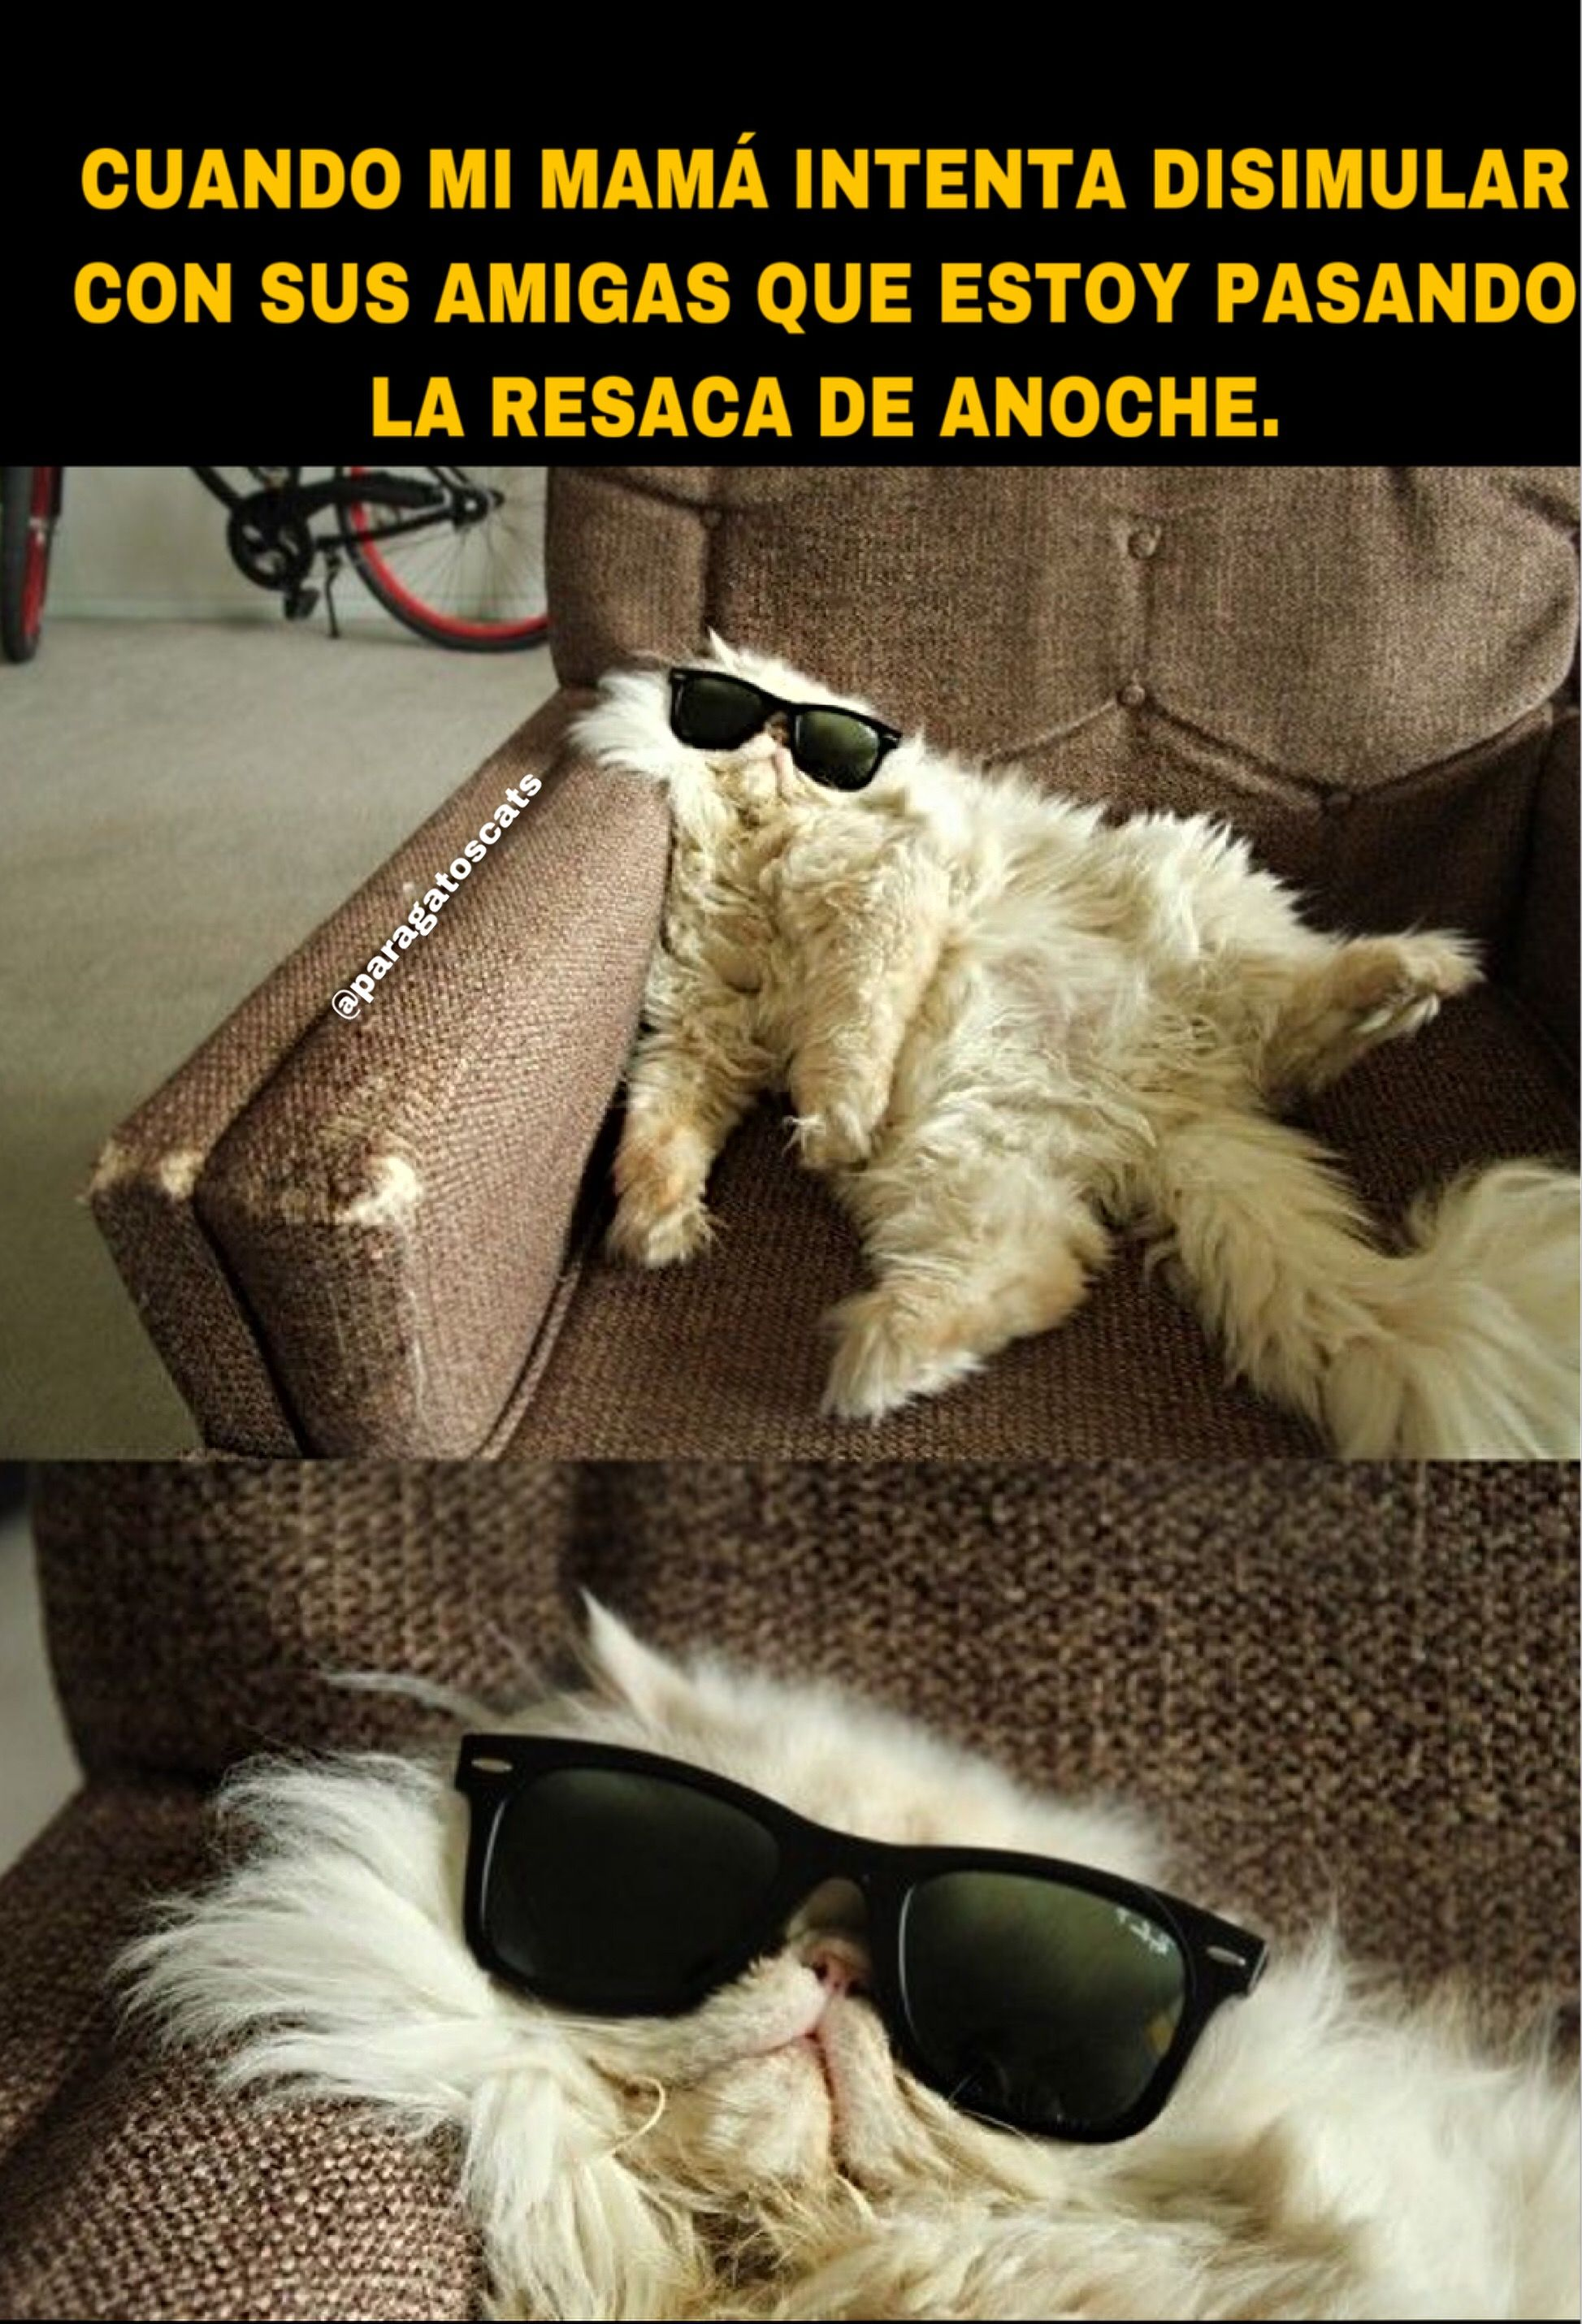 Gato Flojo Gato Con Gafas Memes De Gatos Resaca Cat Memes Memes Humor